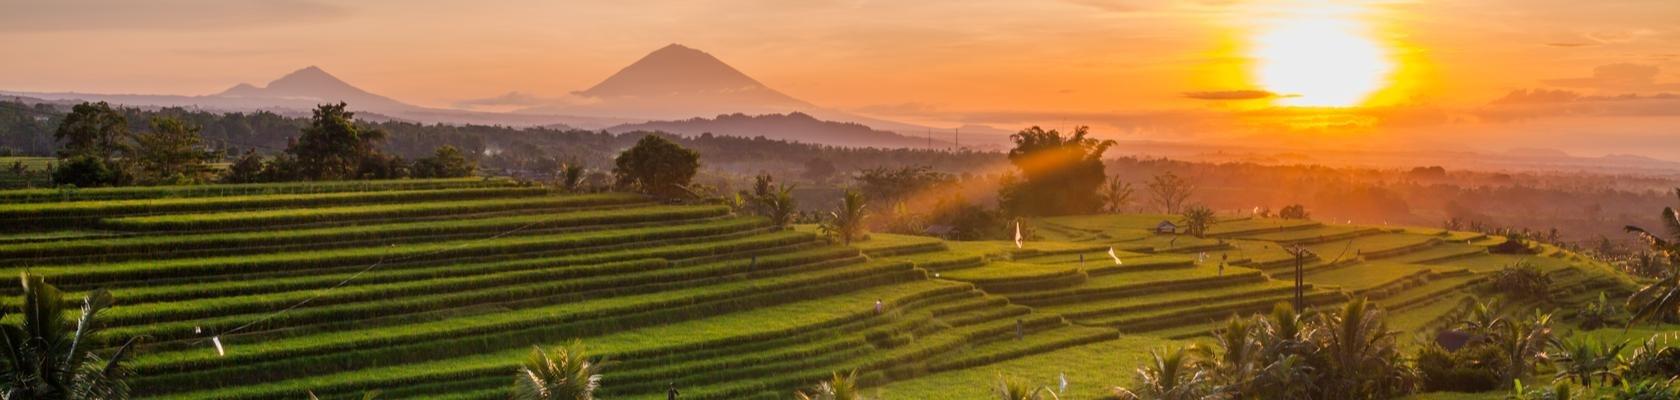 Zonsopkomst over de rijstterrassen in het binnenland